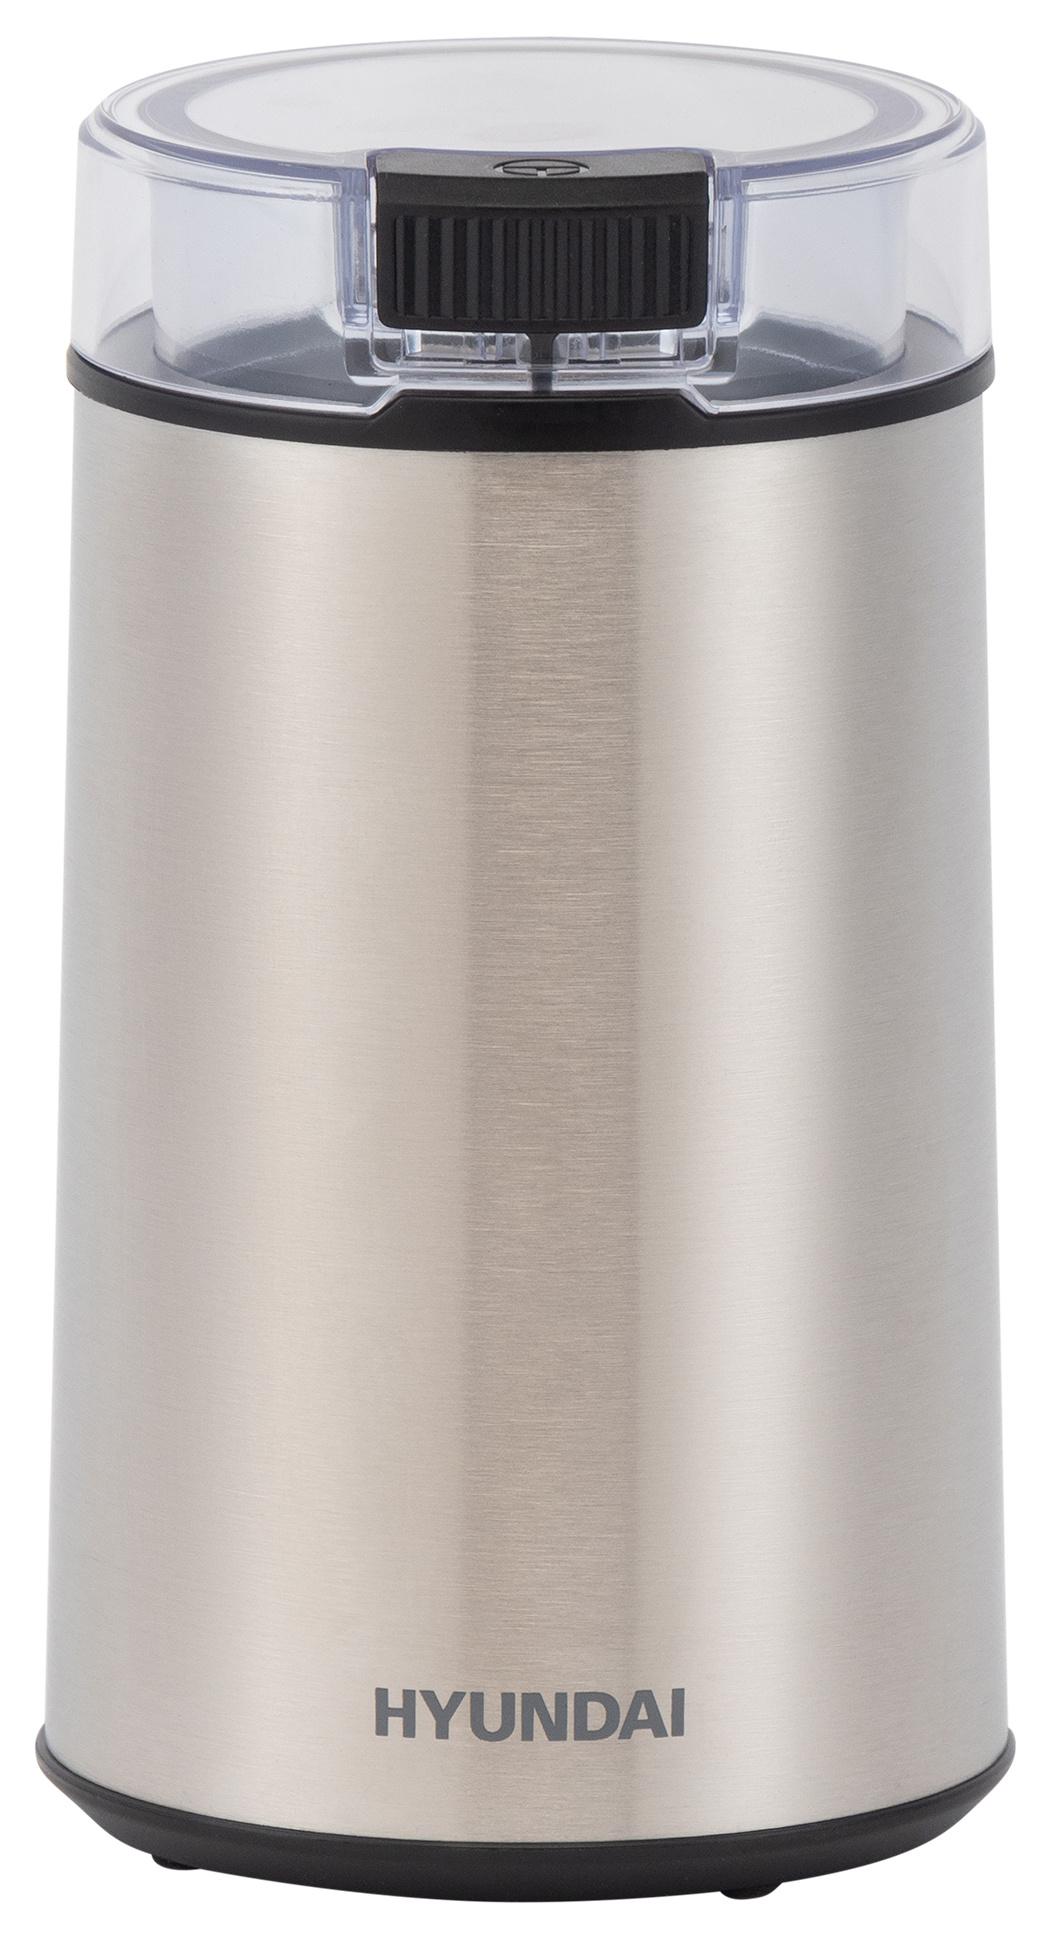 Кофемолка Hyundai HYC-G5261 200Вт сист.помол.:ротац.нож вместим.:60гр черный